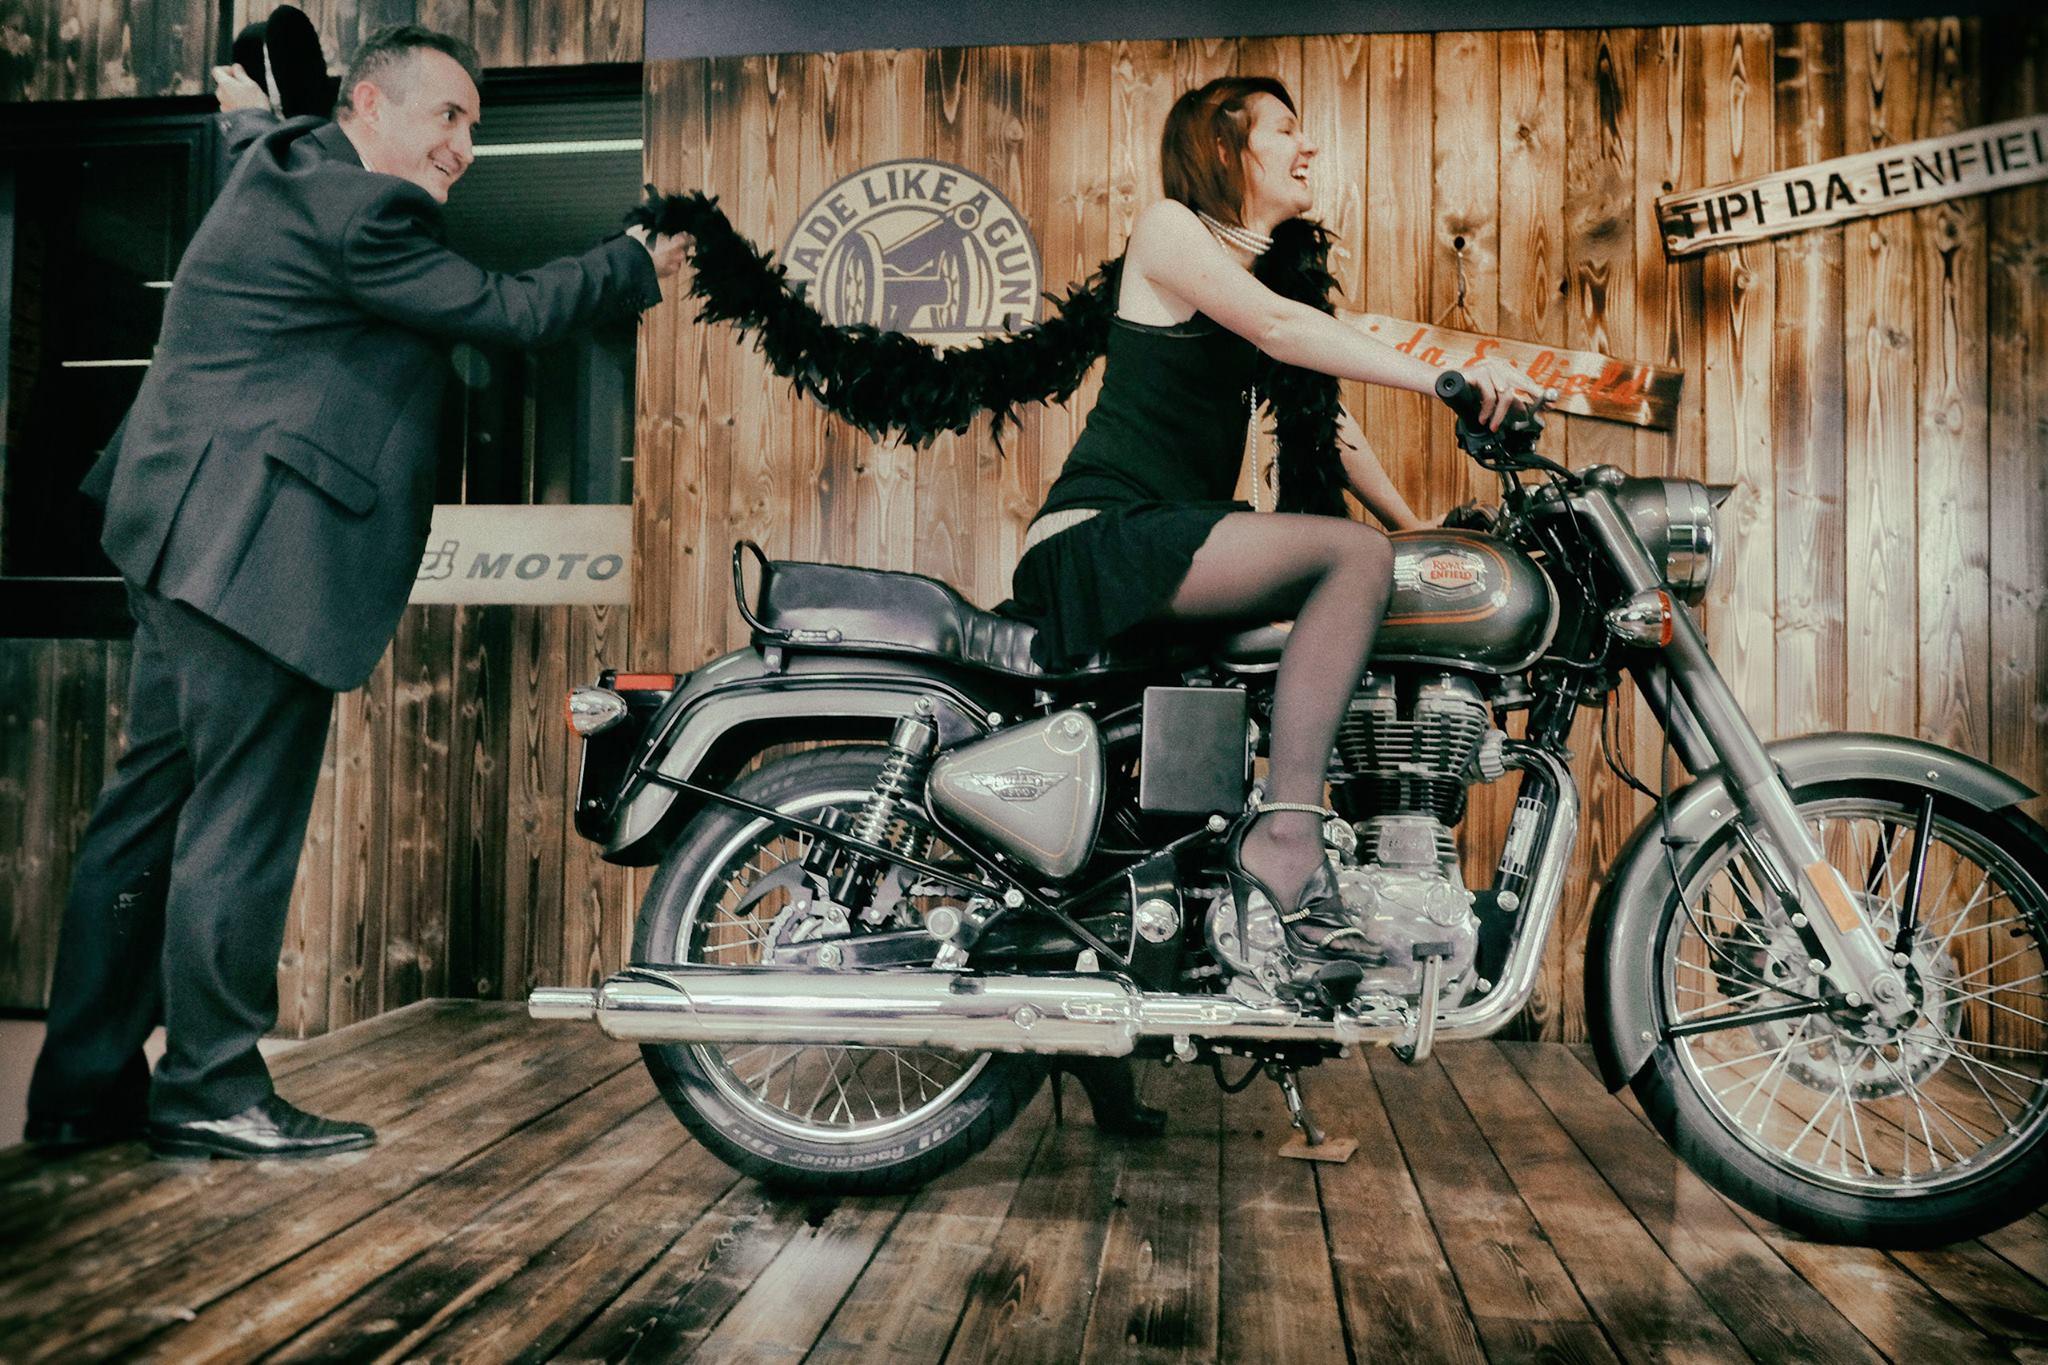 royal-enfield-piacenza-moruzzi-moto-wonderland-campagna-promo-18